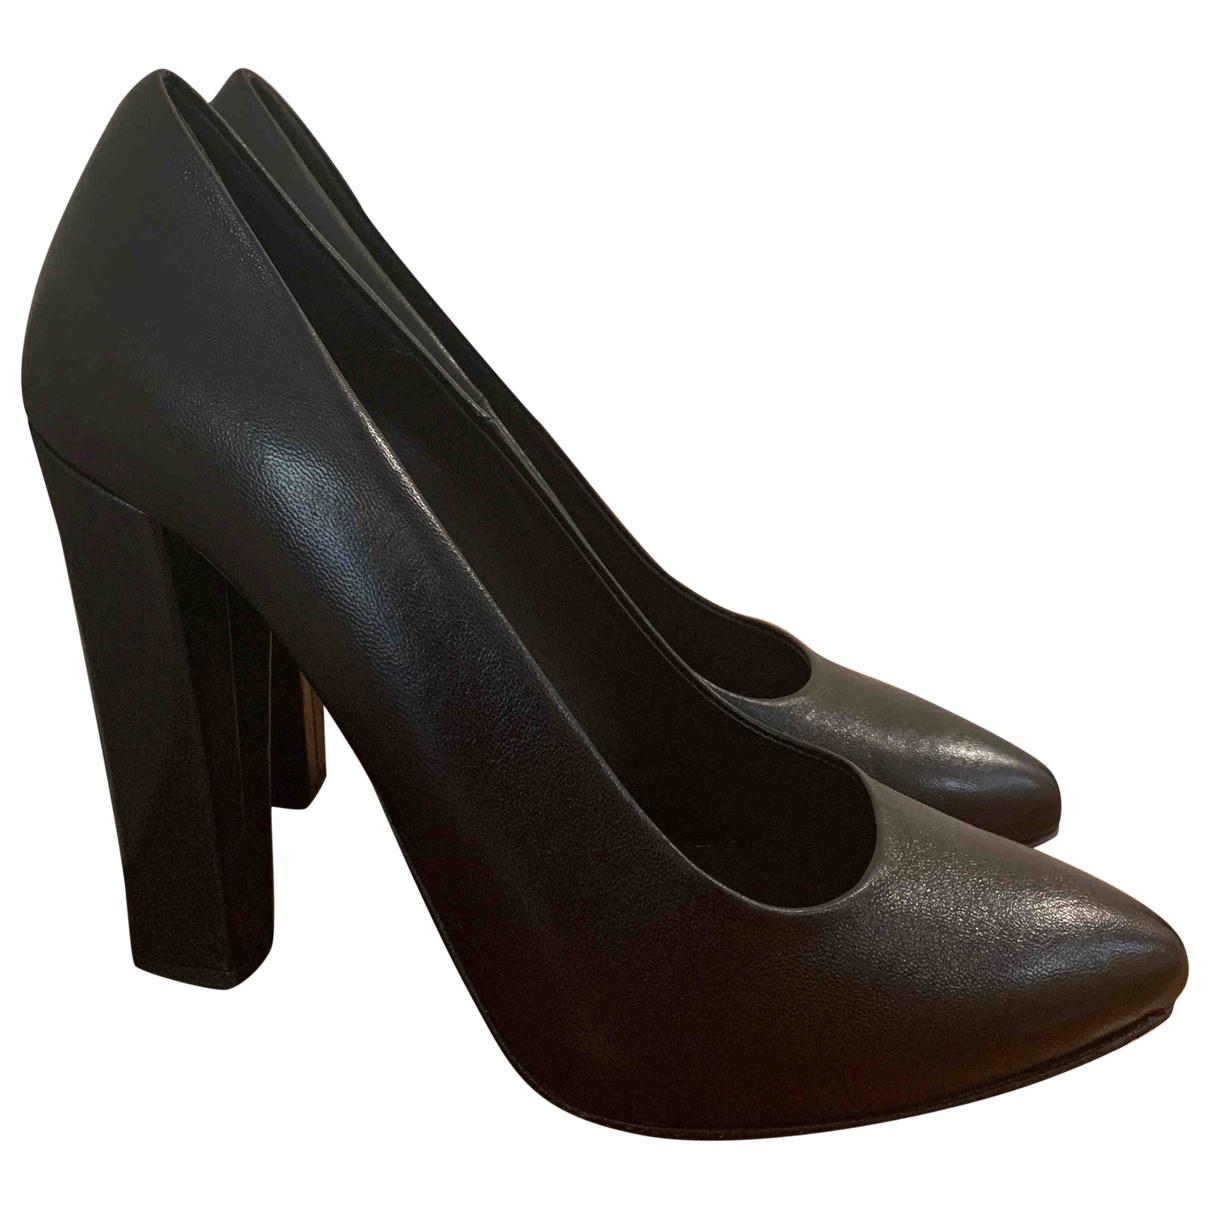 Mauro Grifoni \N Black Leather Heels for Women 39 EU